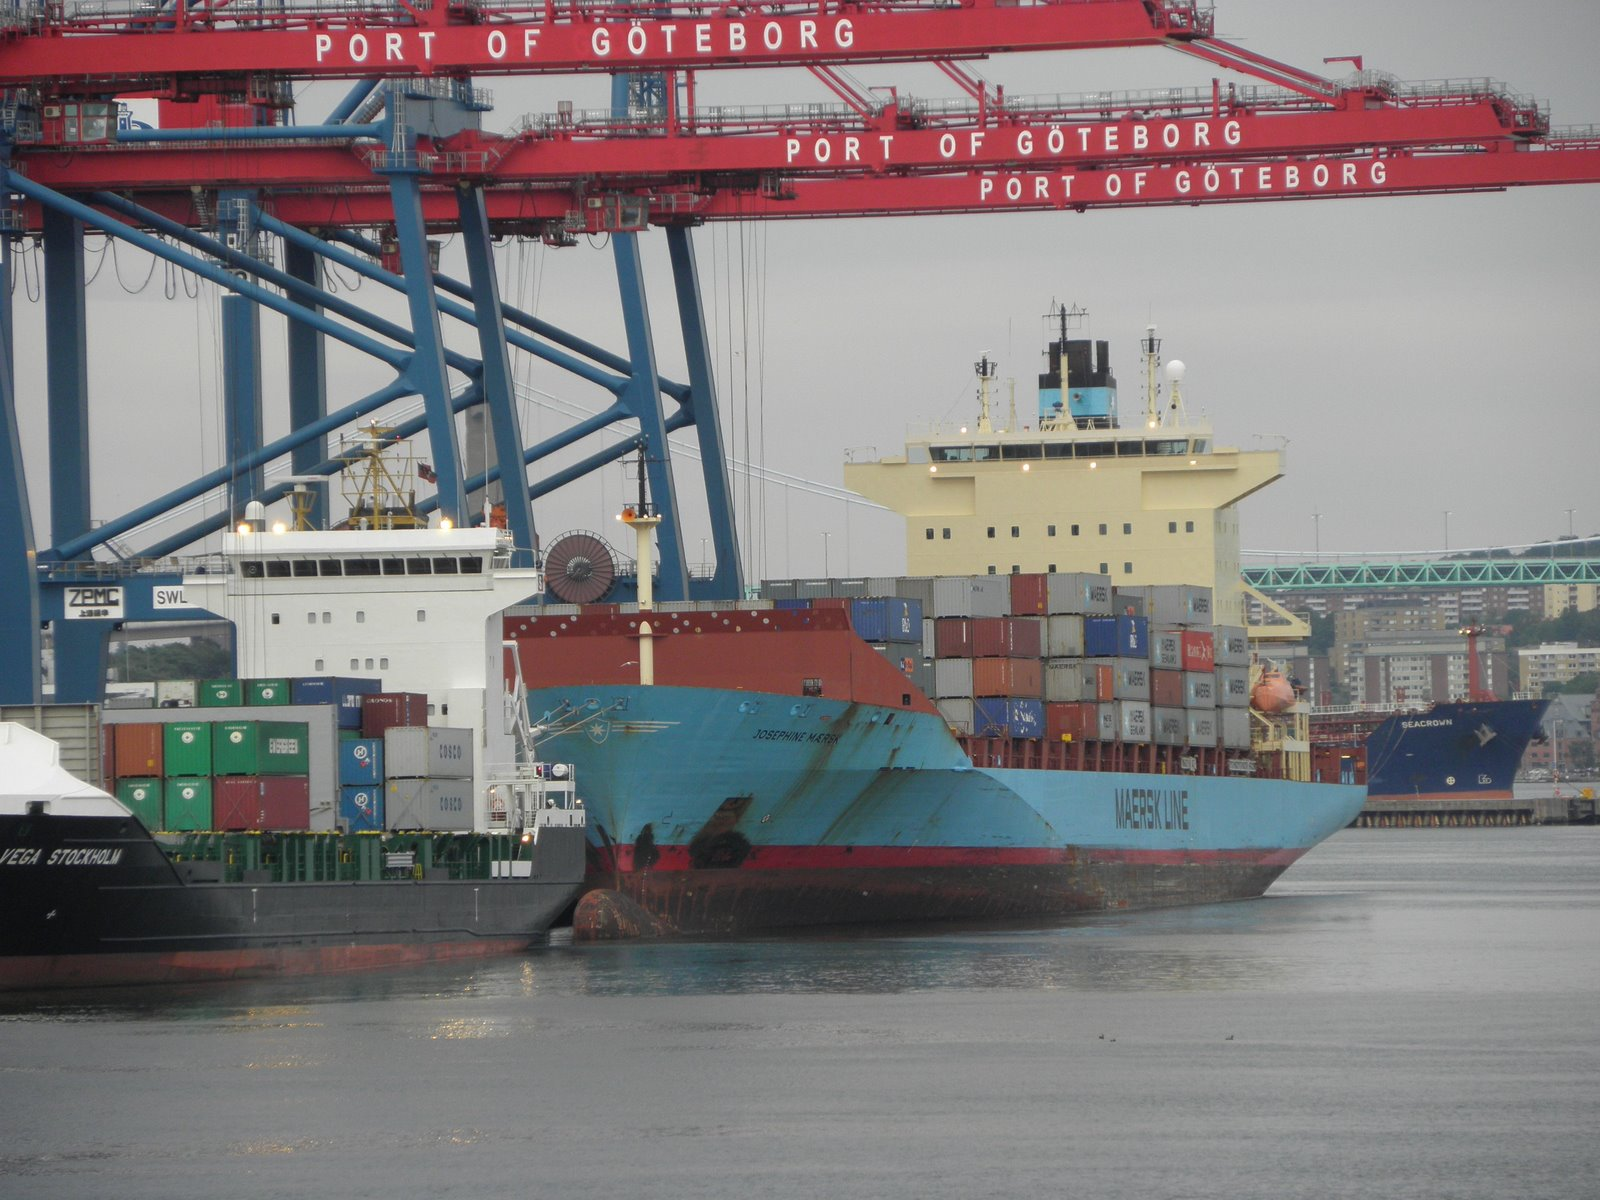 [josephine+maersk+17-07-09+gotenborg+2.JPG]